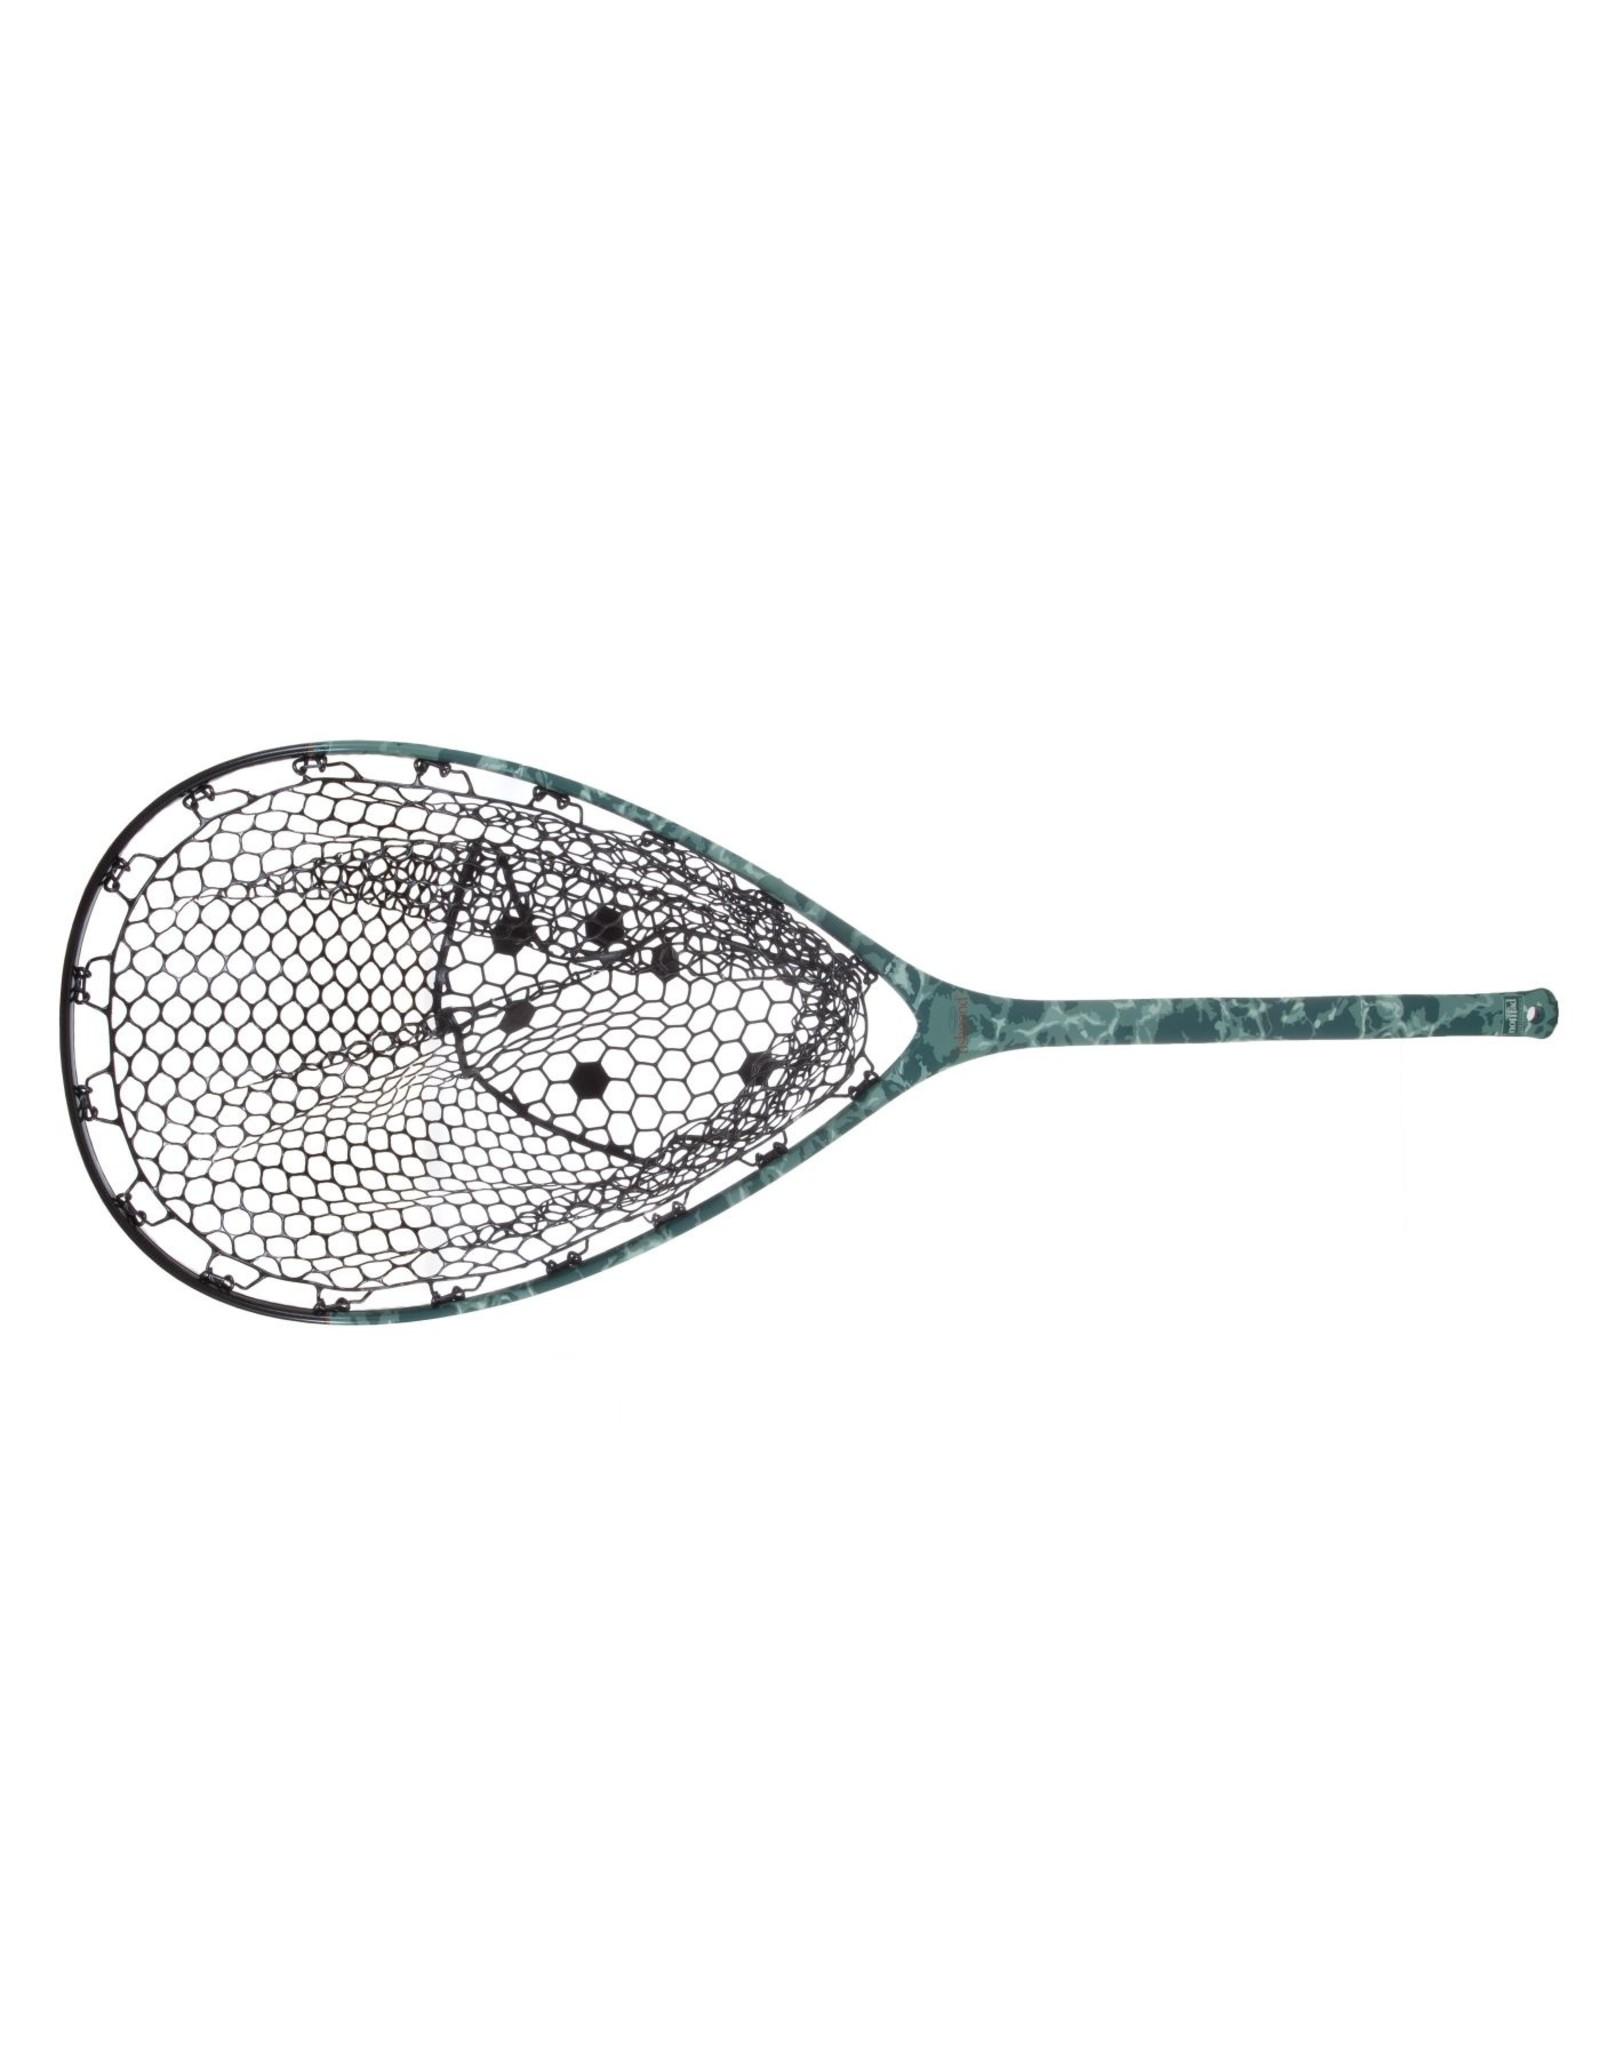 Fishpond Fishpond - Mid-Length Boat Net